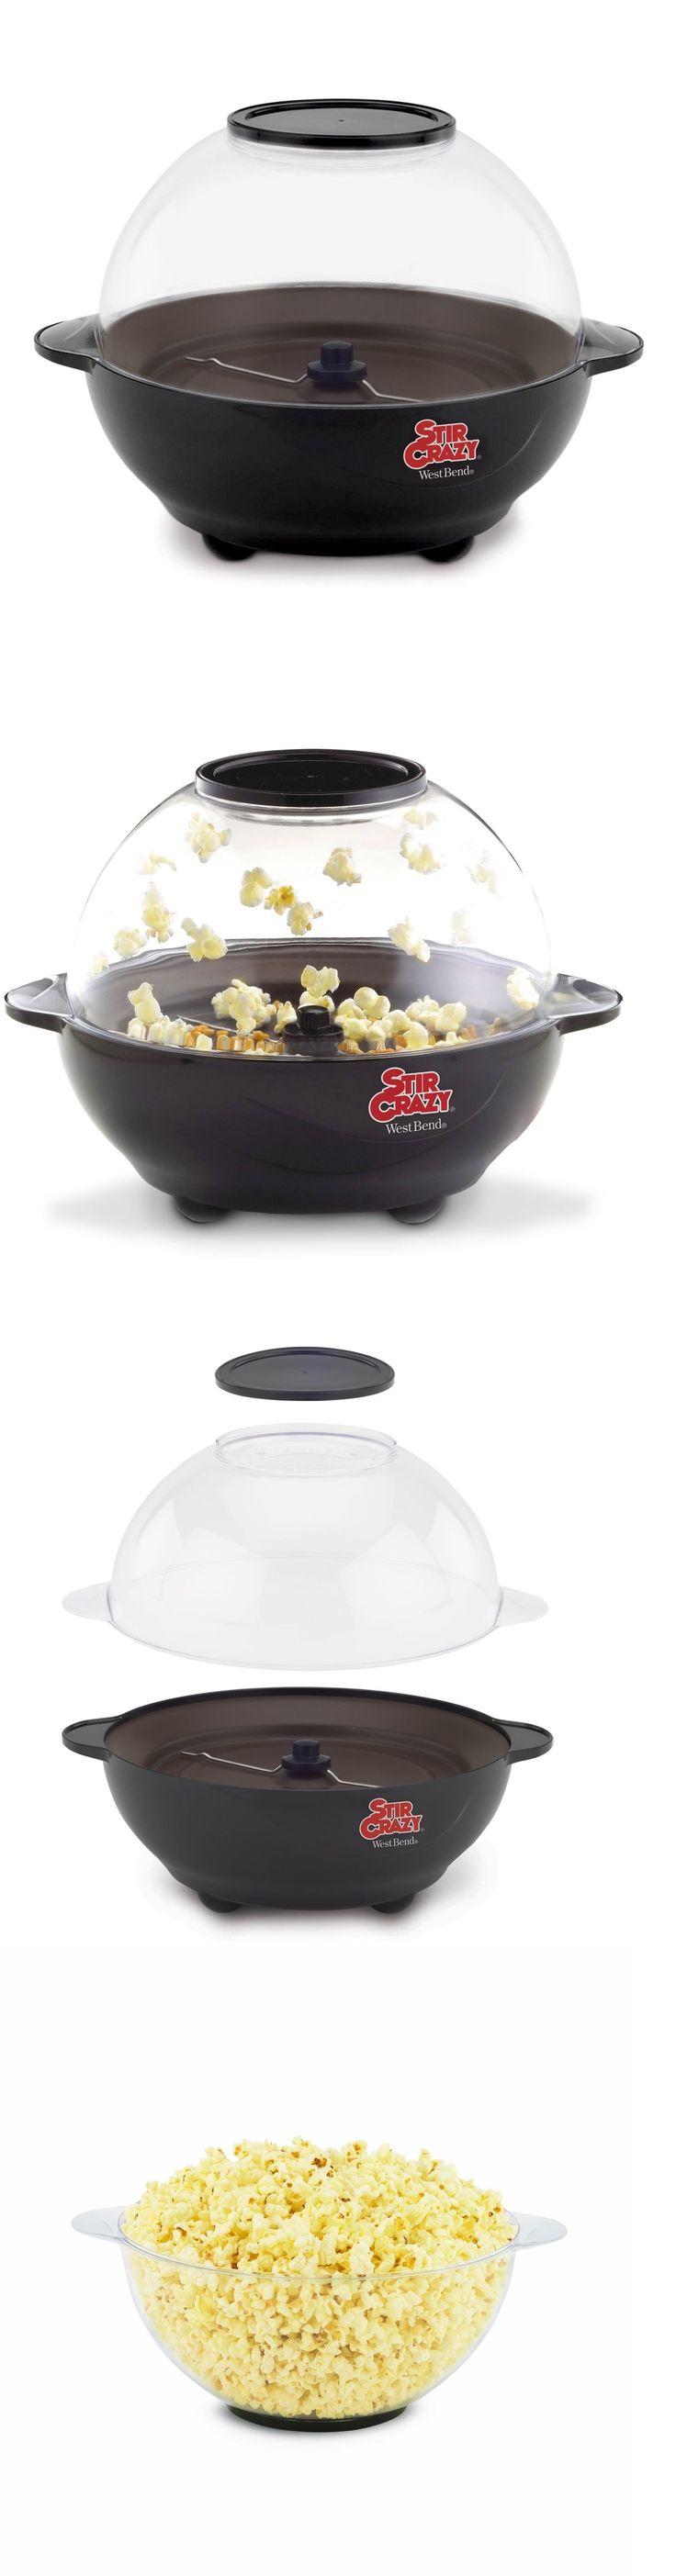 Popcorn Poppers 66752: Popcorn Machine Hot Pop Movie Red Stir Maker Air Corn New West Bend Popper Crazy -> BUY IT NOW ONLY: $34.92 on eBay!